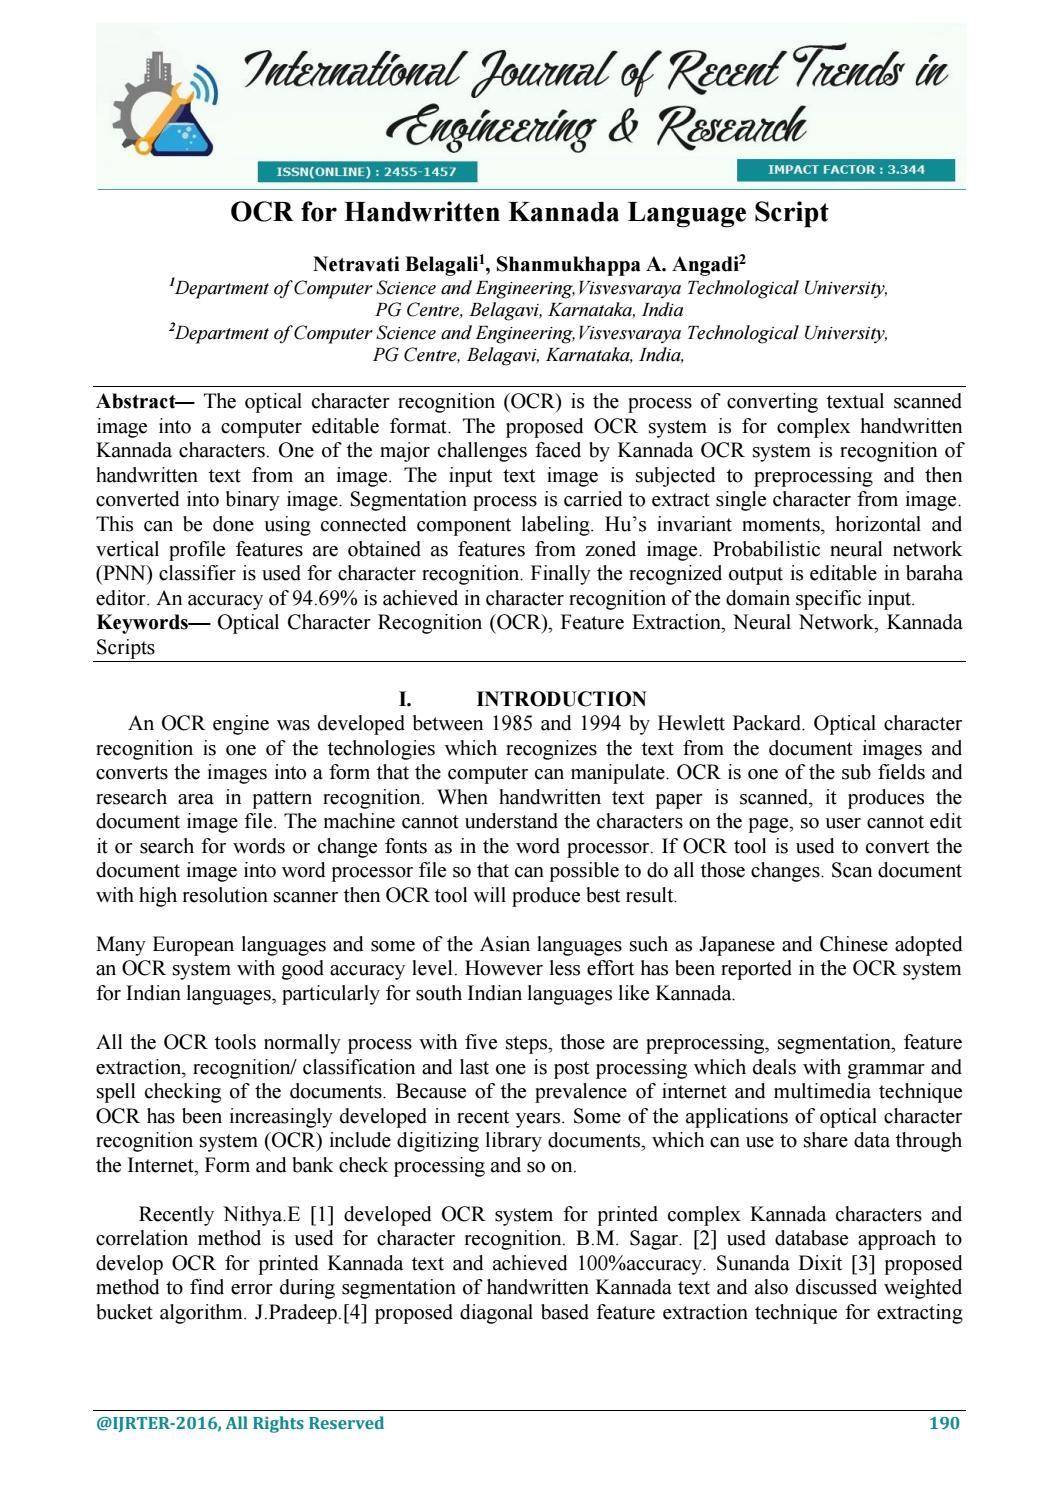 Ocr for handwritten kannada language script by IJRTER - issuu